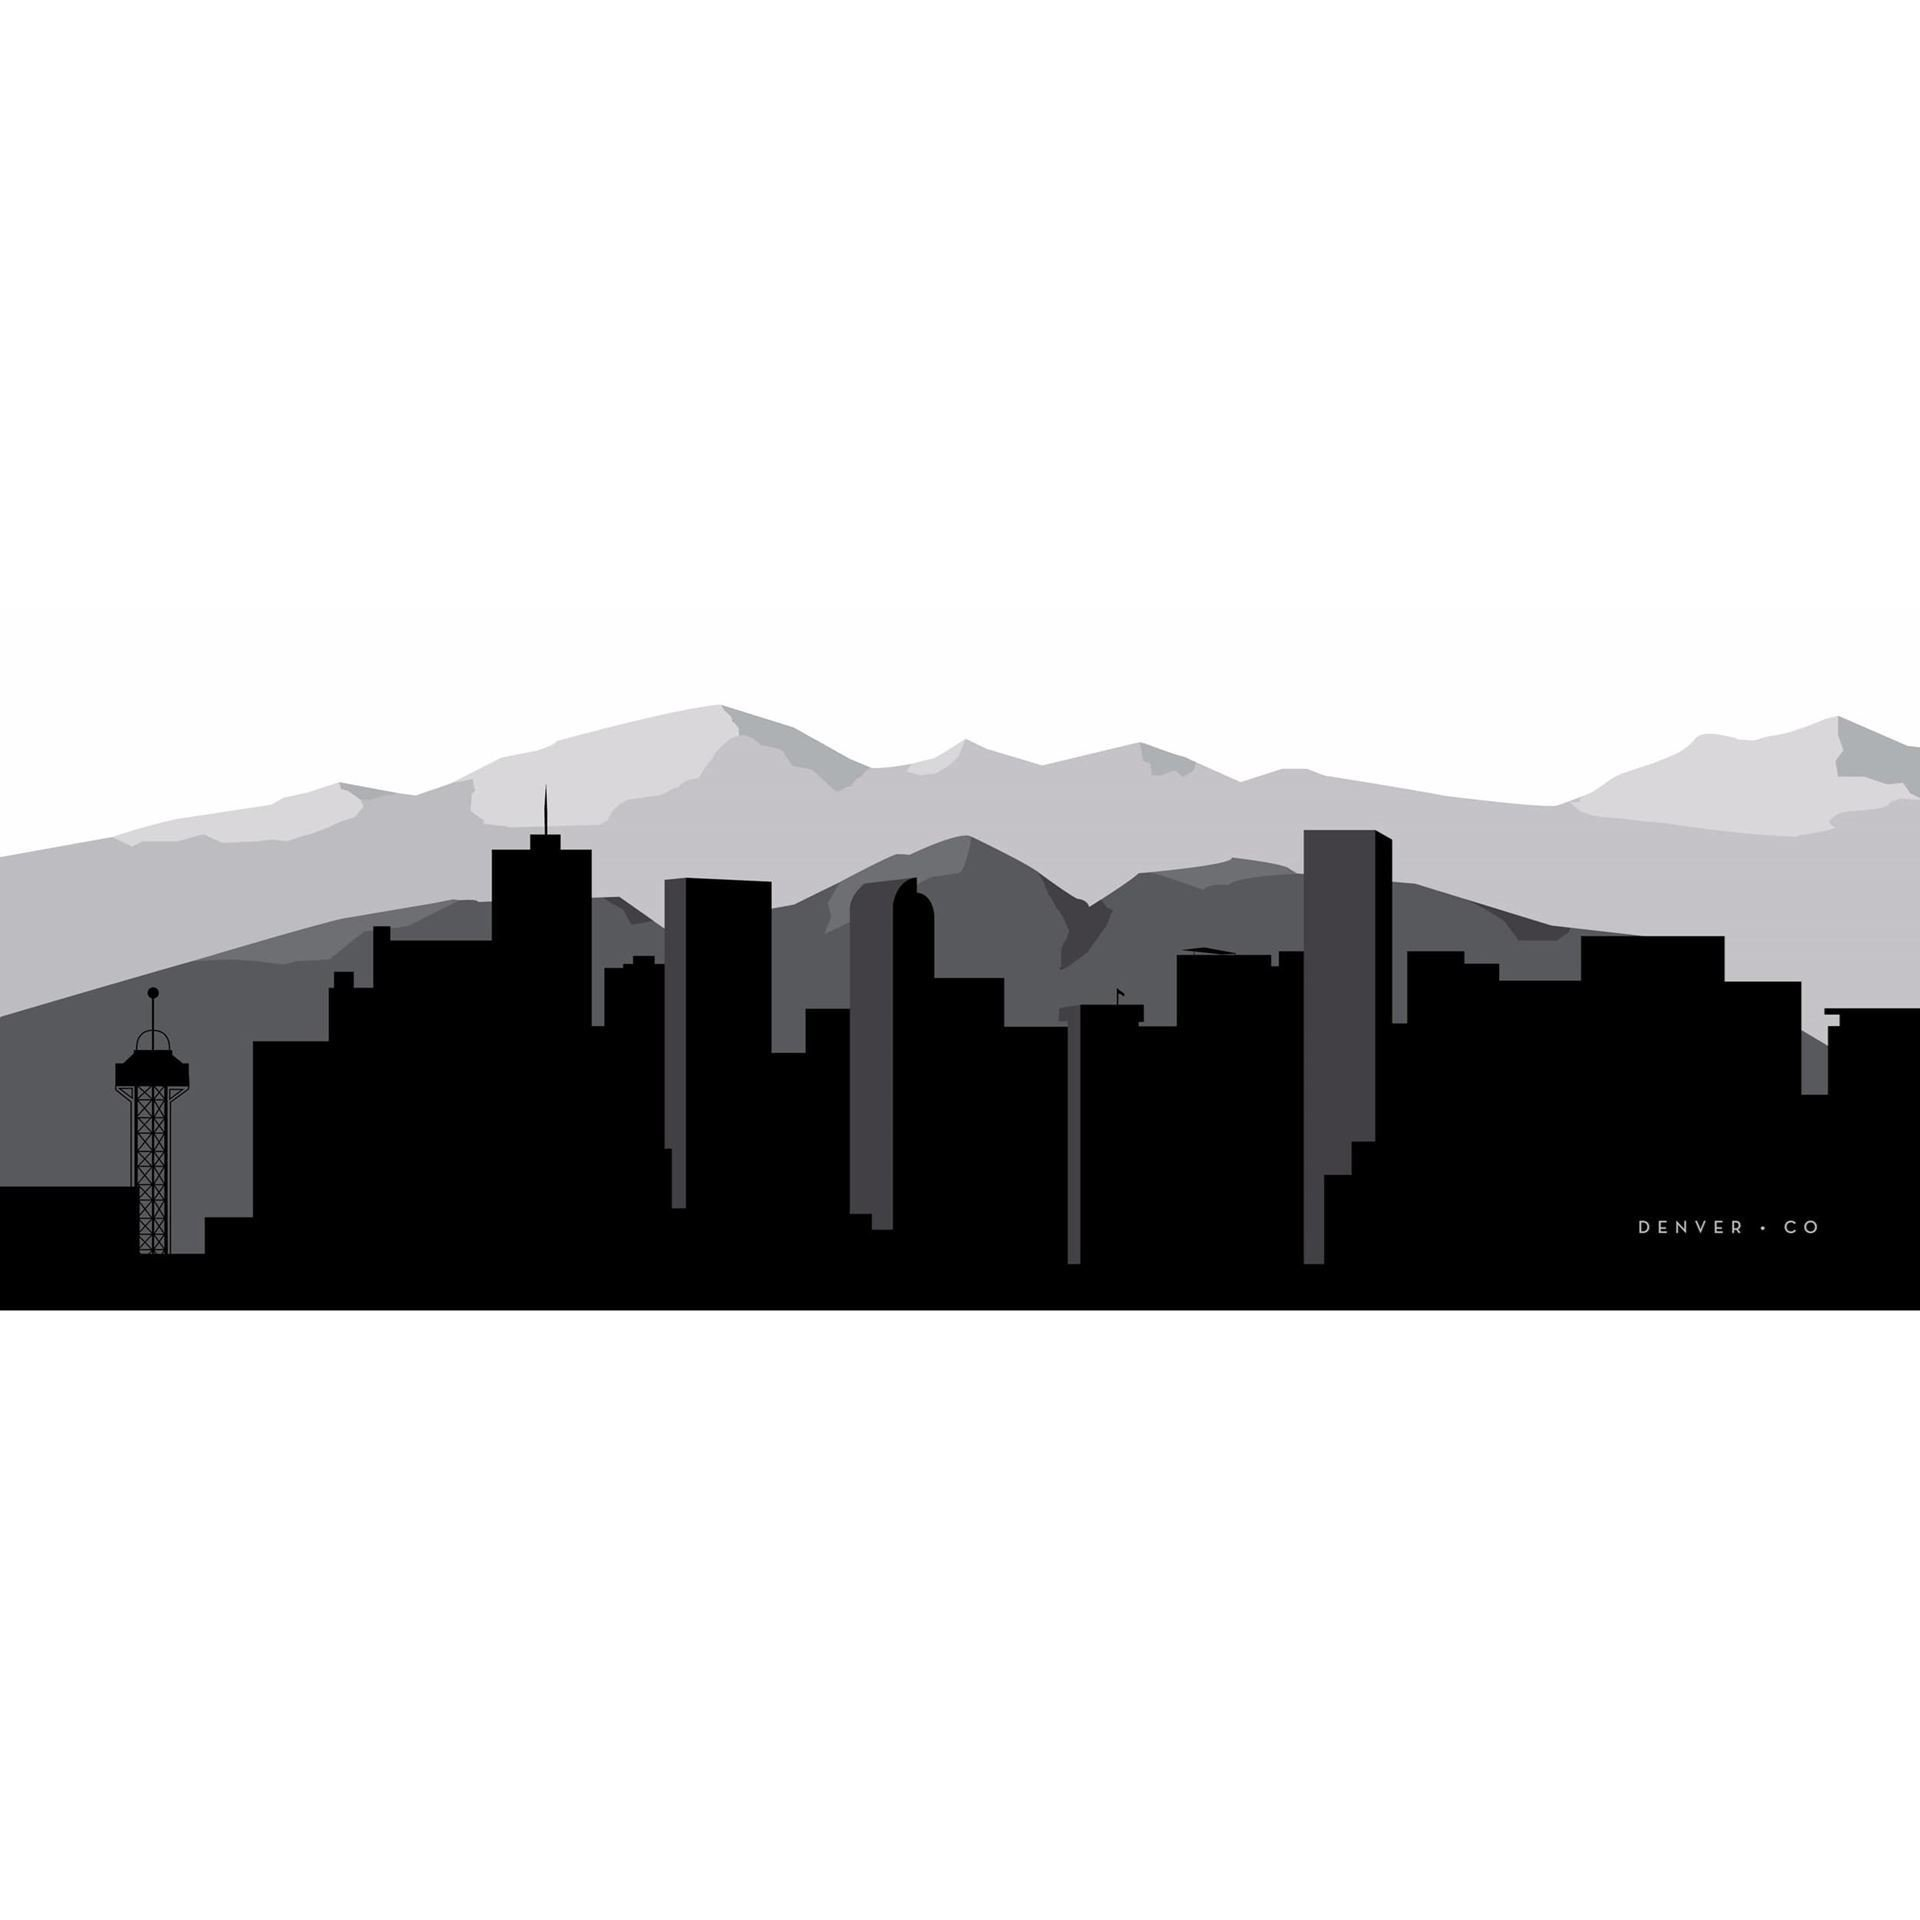 Denver Graphic Skyline 60x20